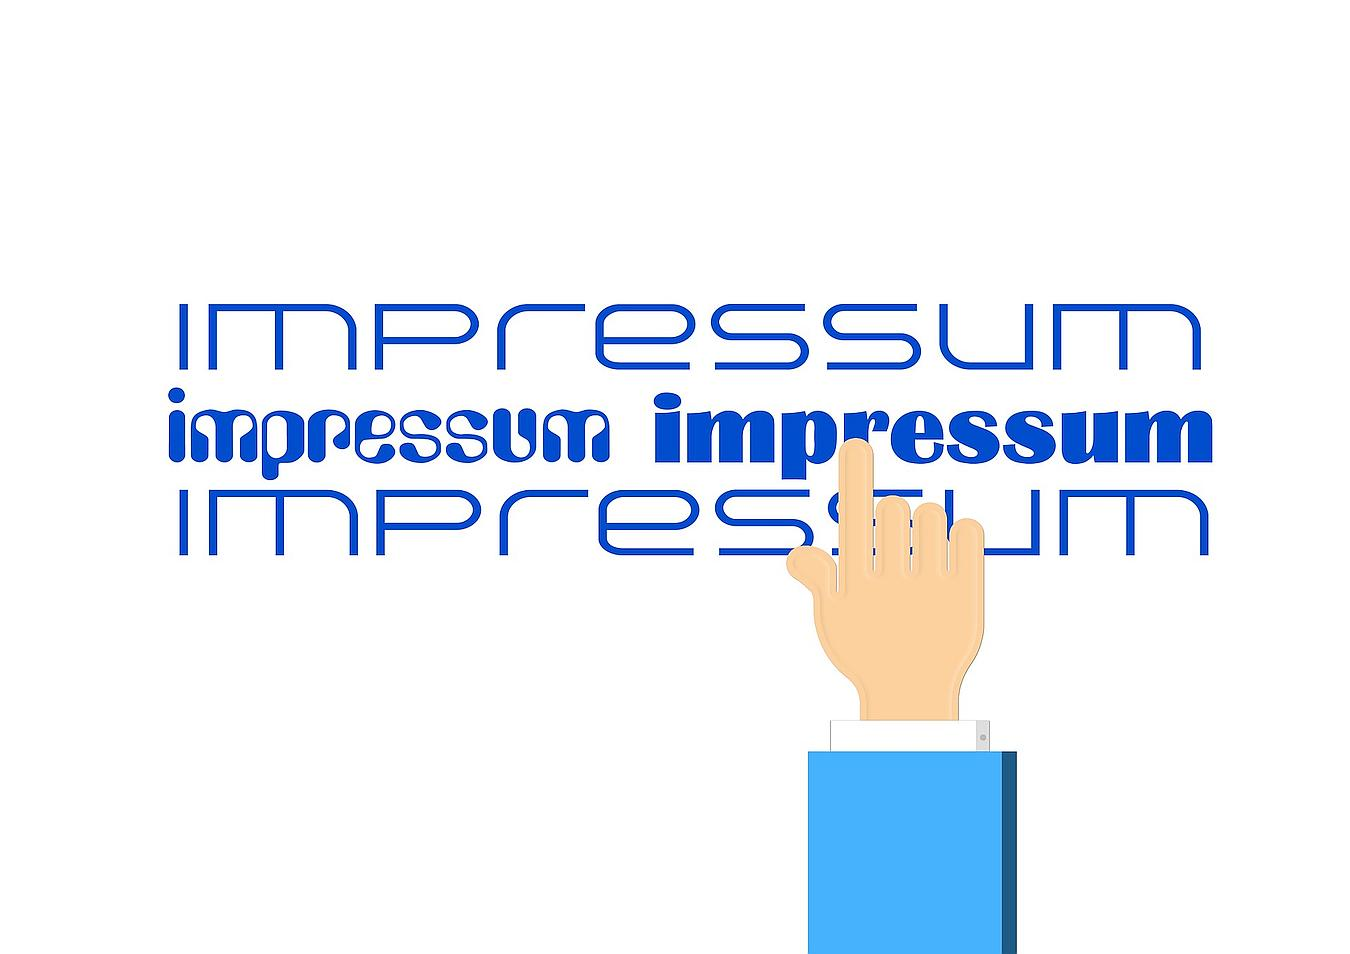 Impressum - Kontakt: Internetblogger.de